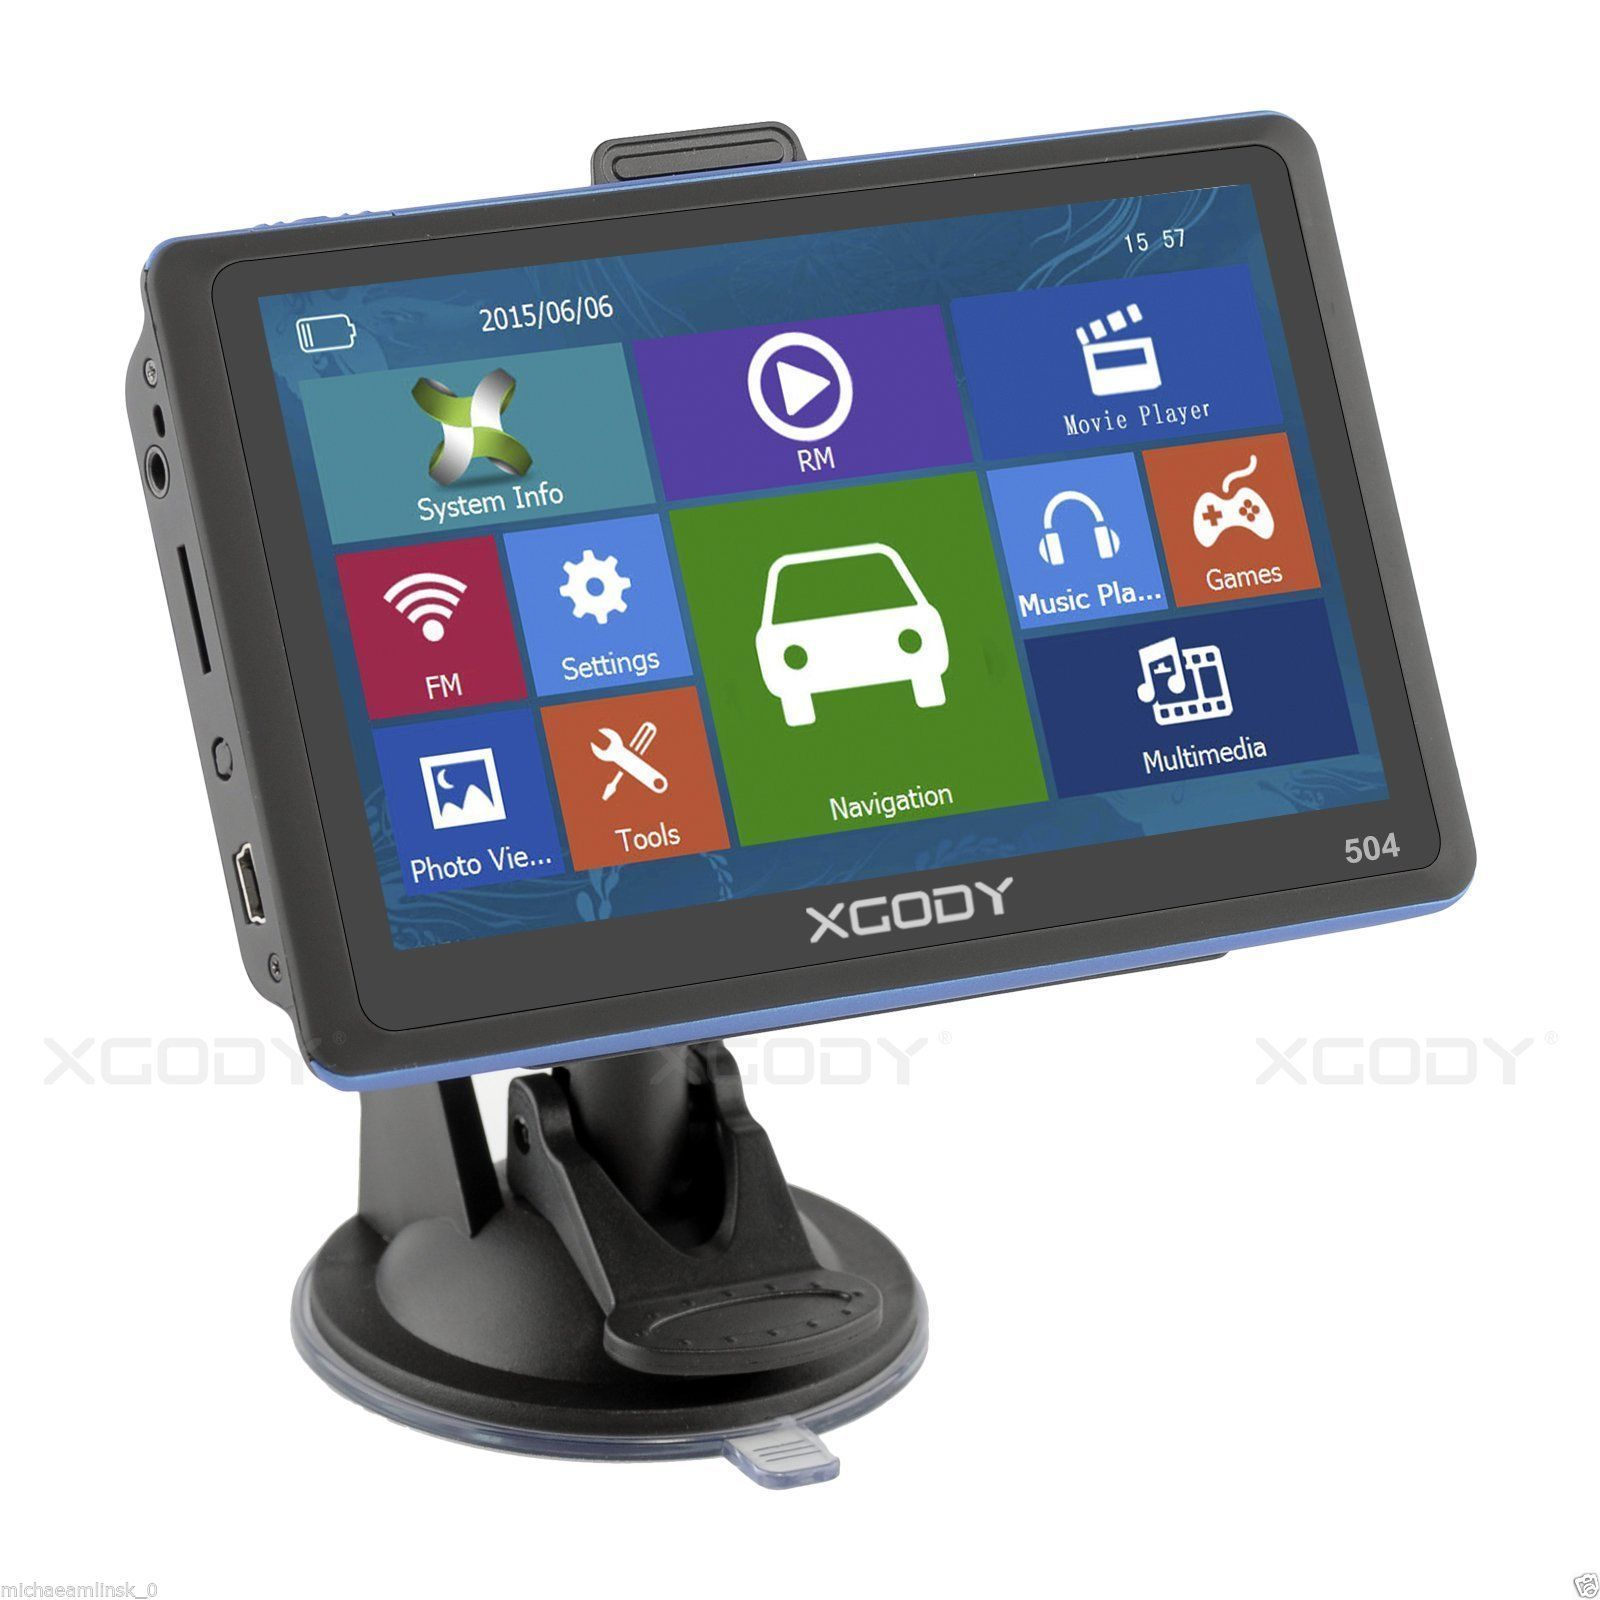 Xgody 5 Inch Sat Nav Lifetime Free Update Car Truck Gps Navigation